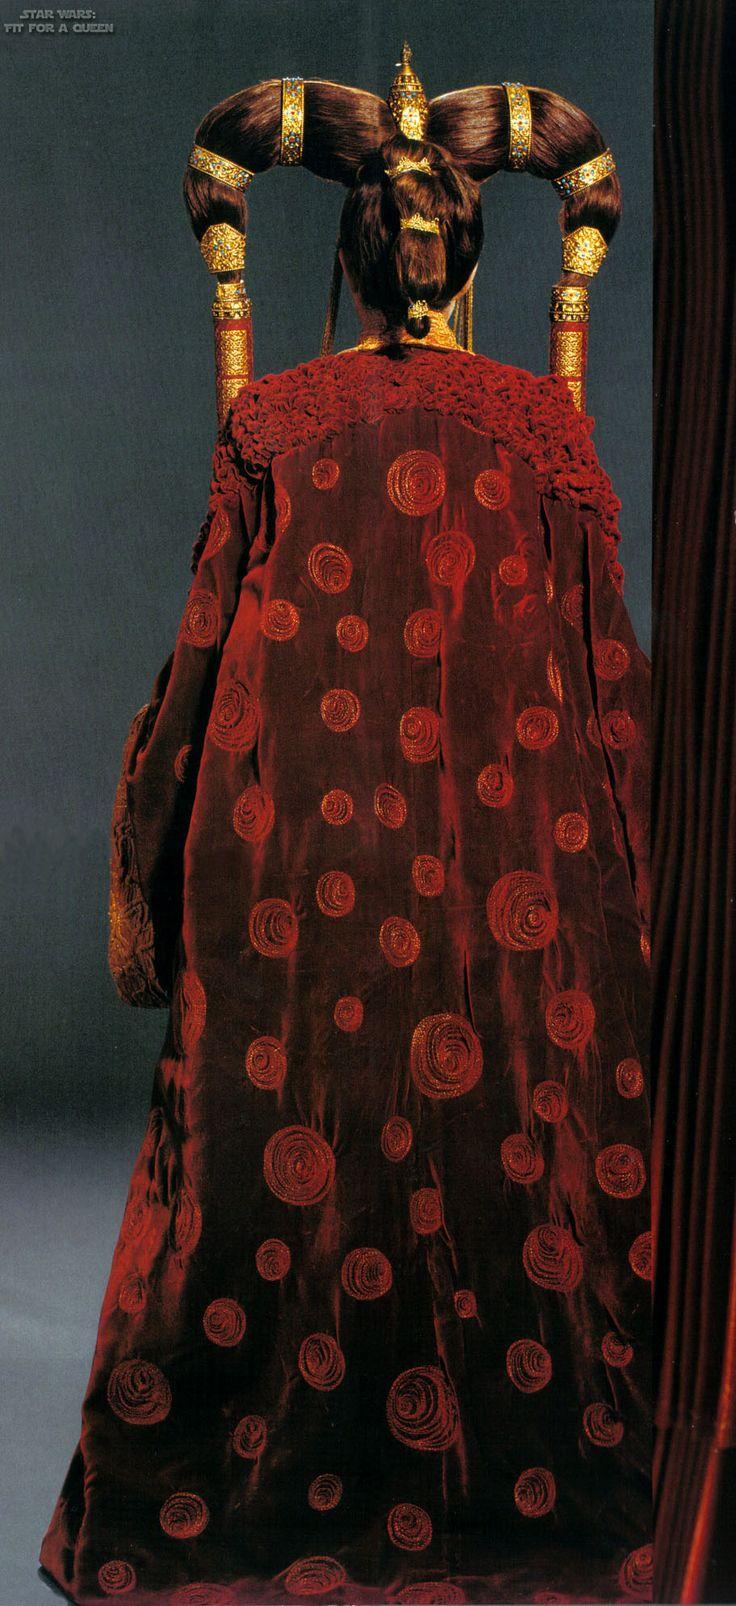 Star Wars Padme Amidala Galactic Senate Dress With Cloak - Back view